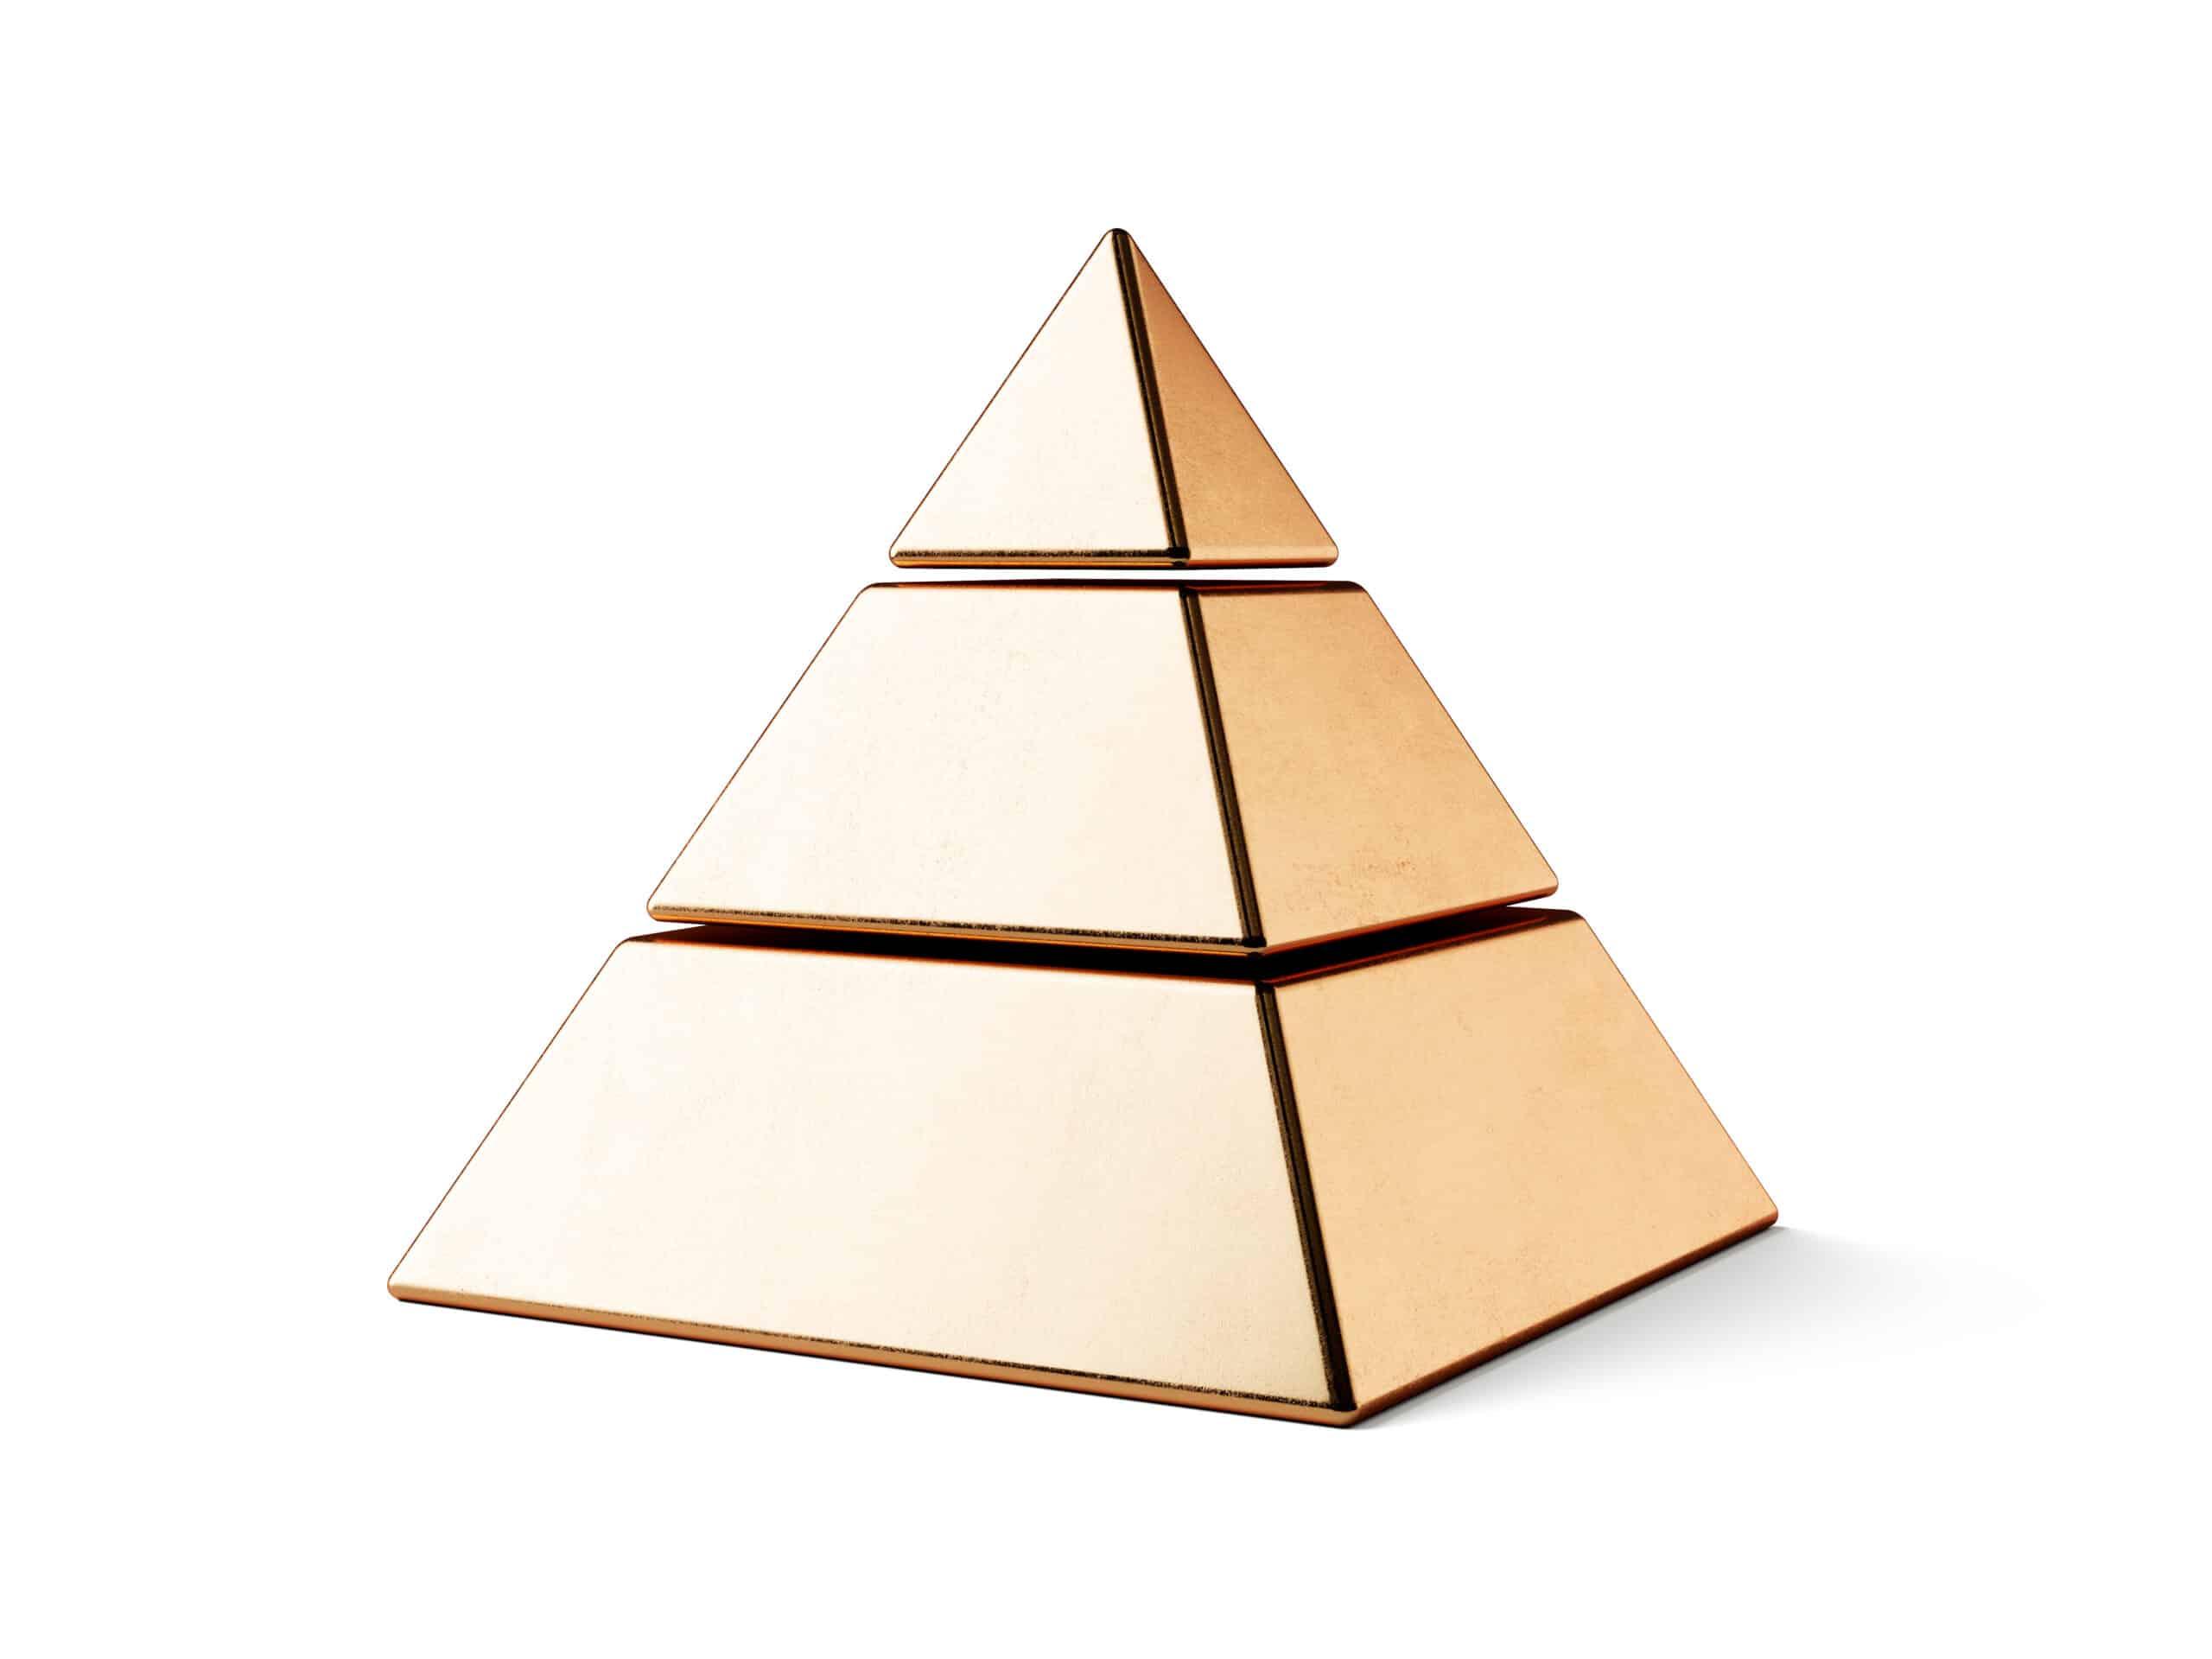 Pyramidensystem